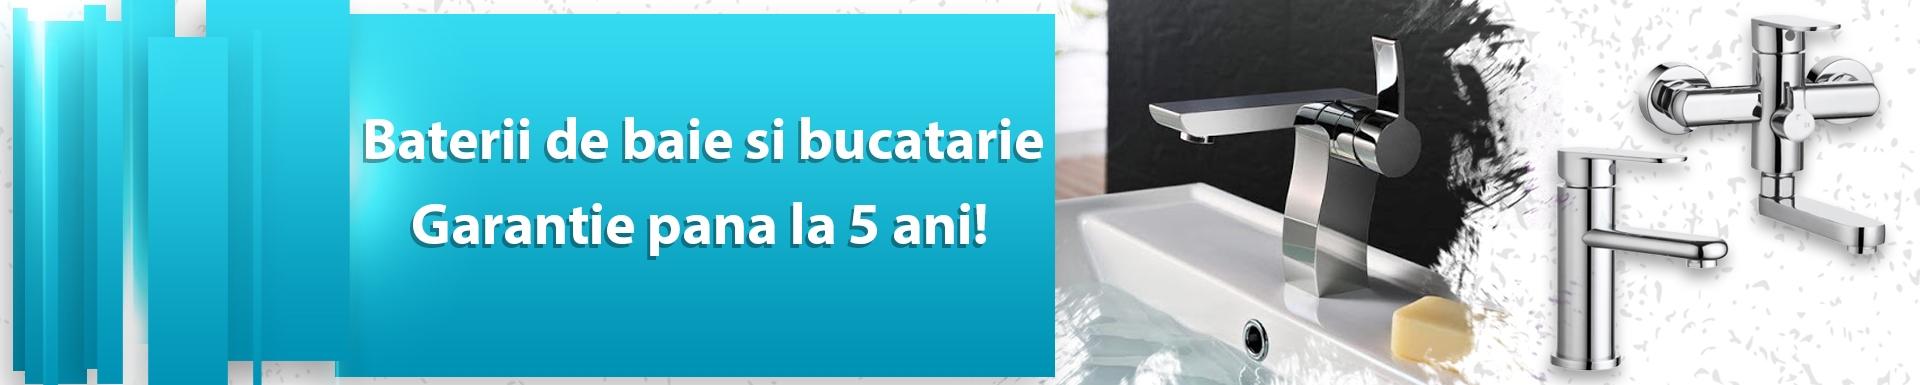 Baterii_de_baie_si_bucatarie_banner